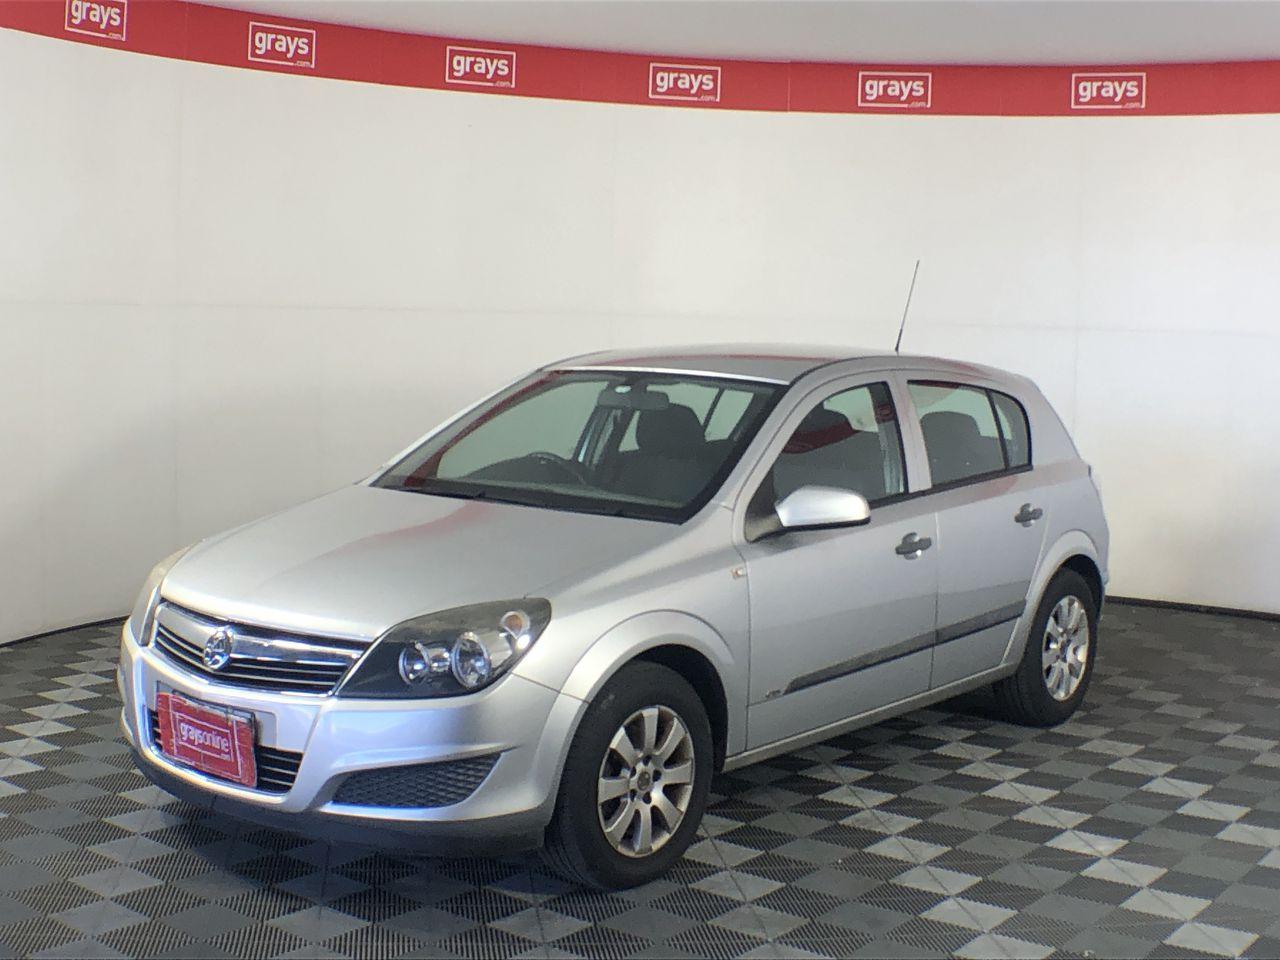 2007 Holden Astra CD AH Manual Hatchback (WOVR+Inspected)